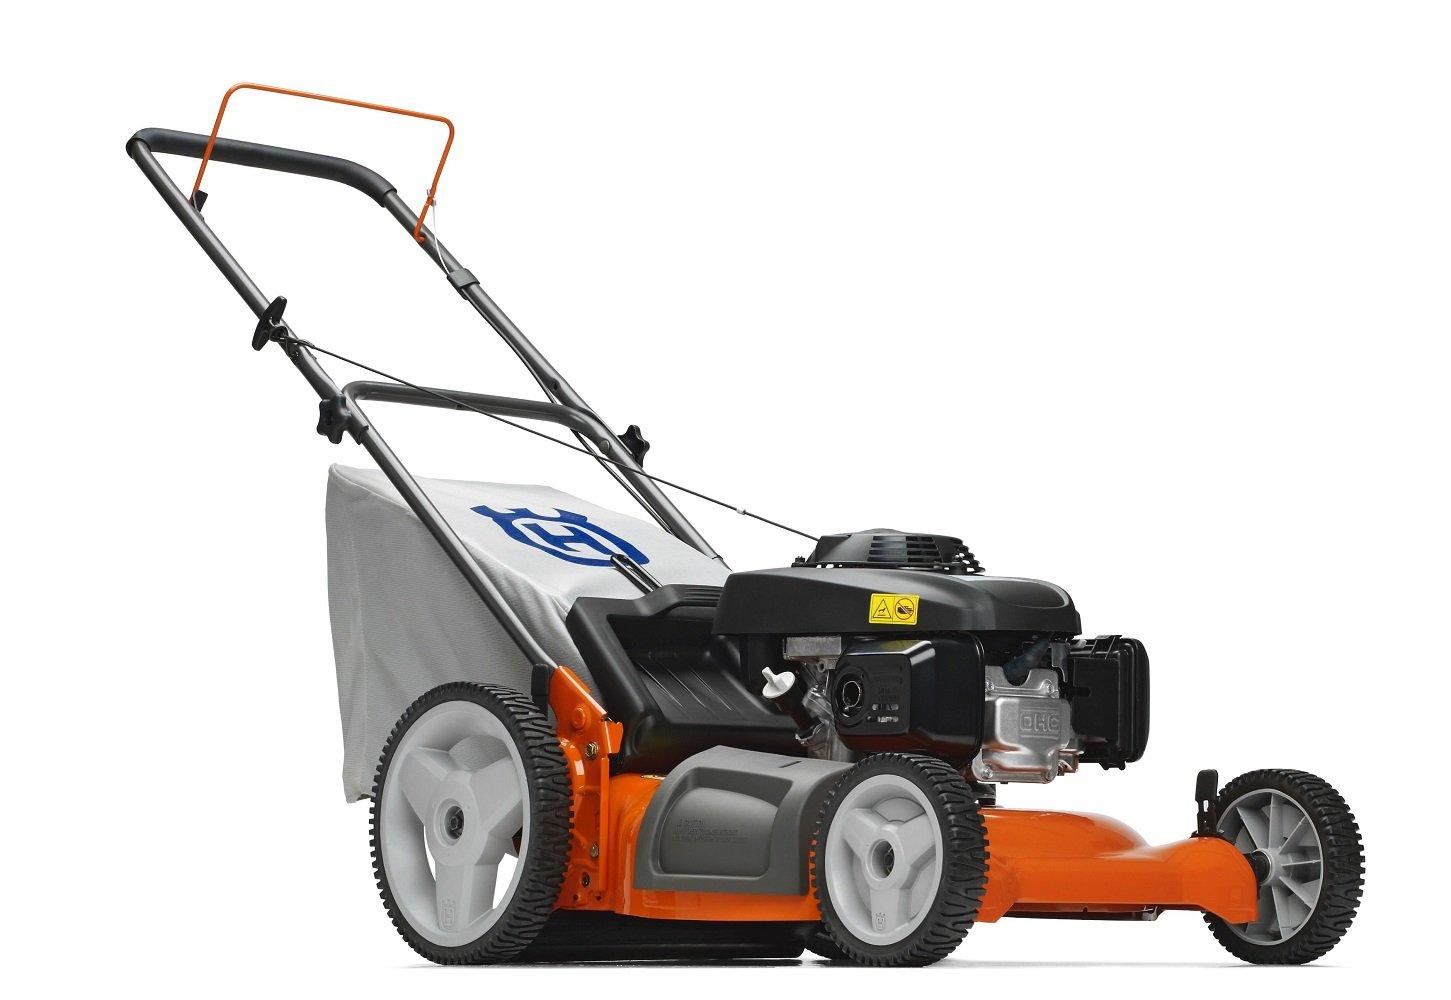 Husqvarna 21'' Push Lawn Mower, 7021P